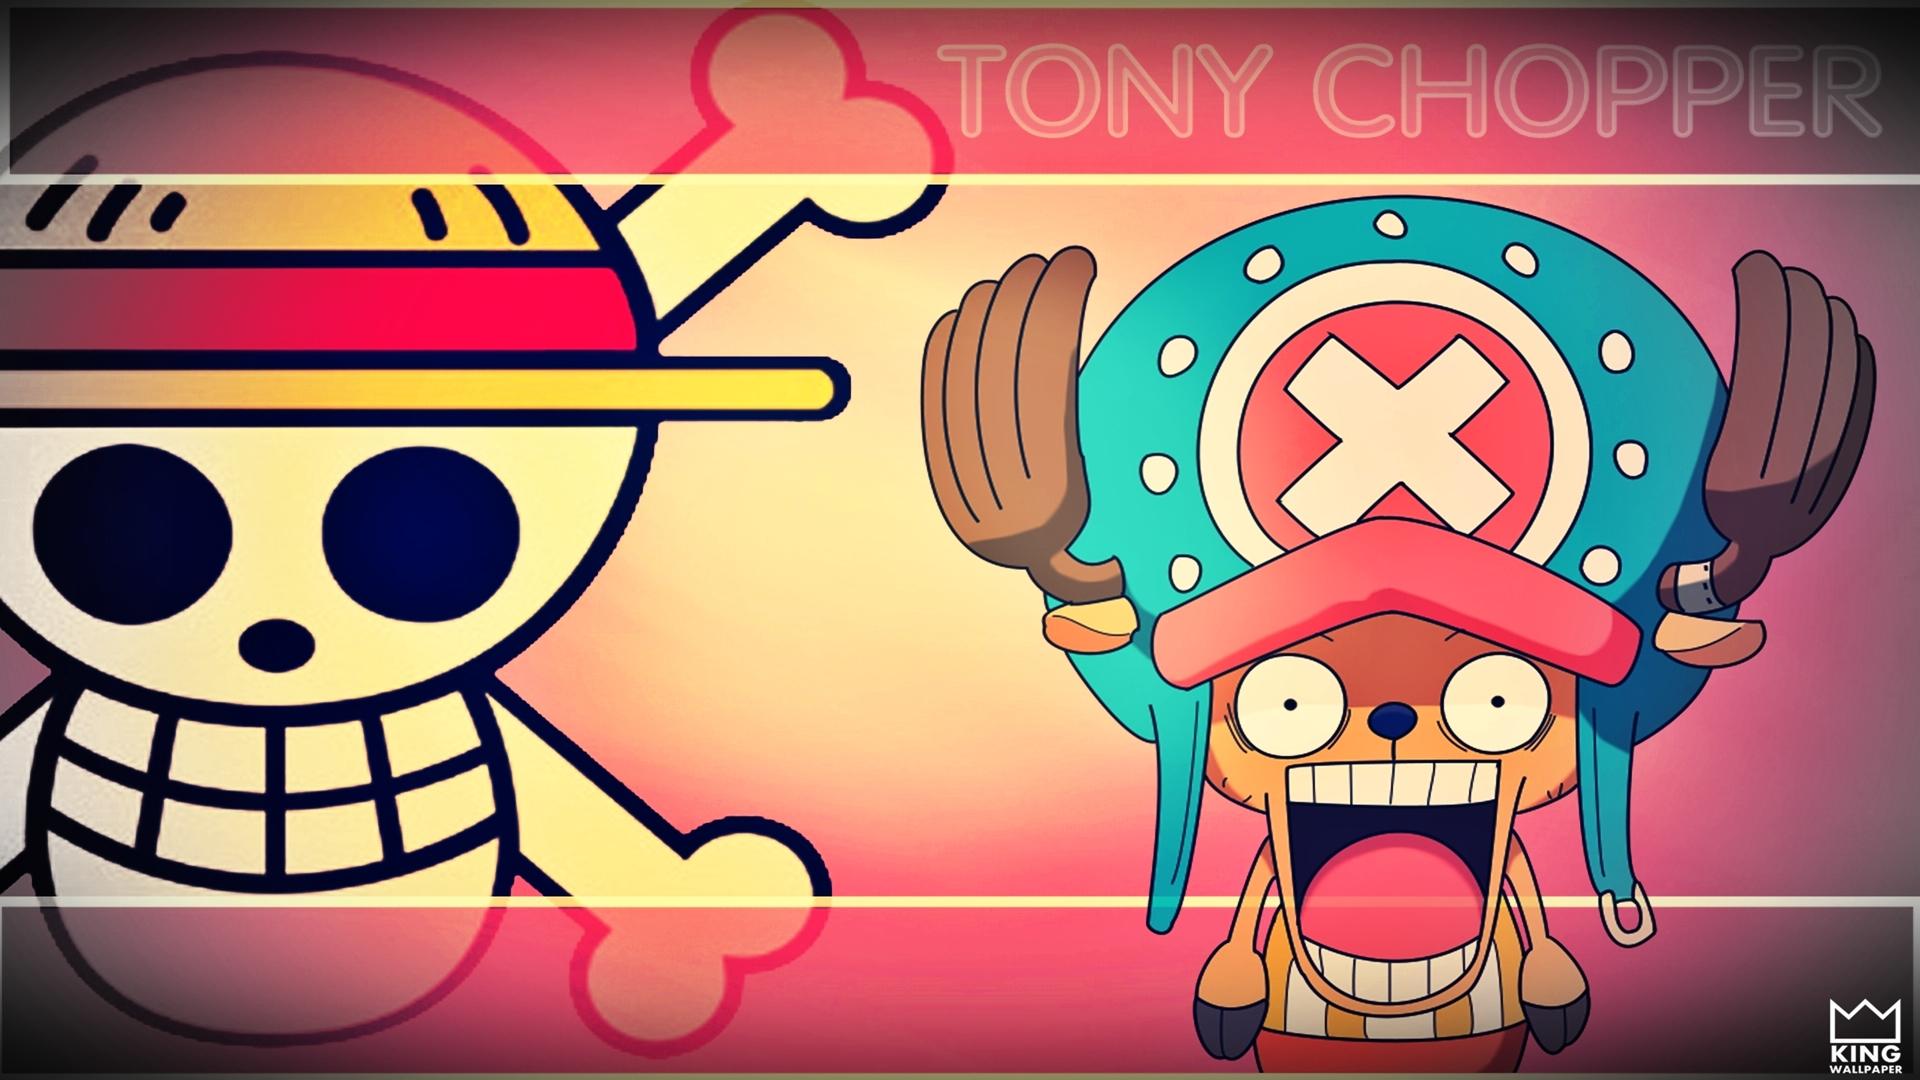 Tony Chopper Wallpaper -  One Piece by KingwallpaperOne Piece Wallpaper Chopper